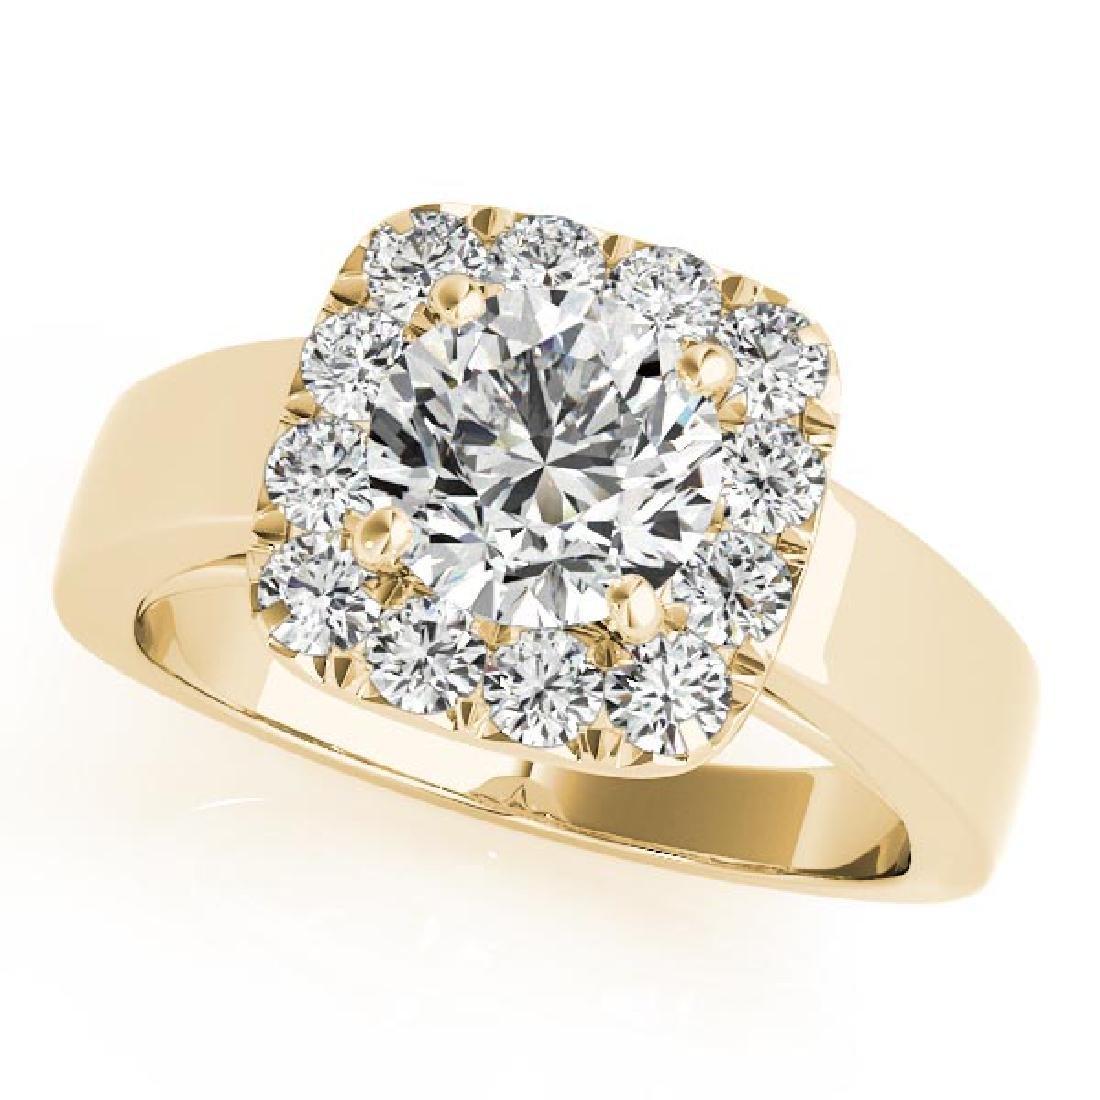 CERTIFIED 18K YELLOW GOLD 1.08 CT G-H/VS-SI1 DIAMOND HA